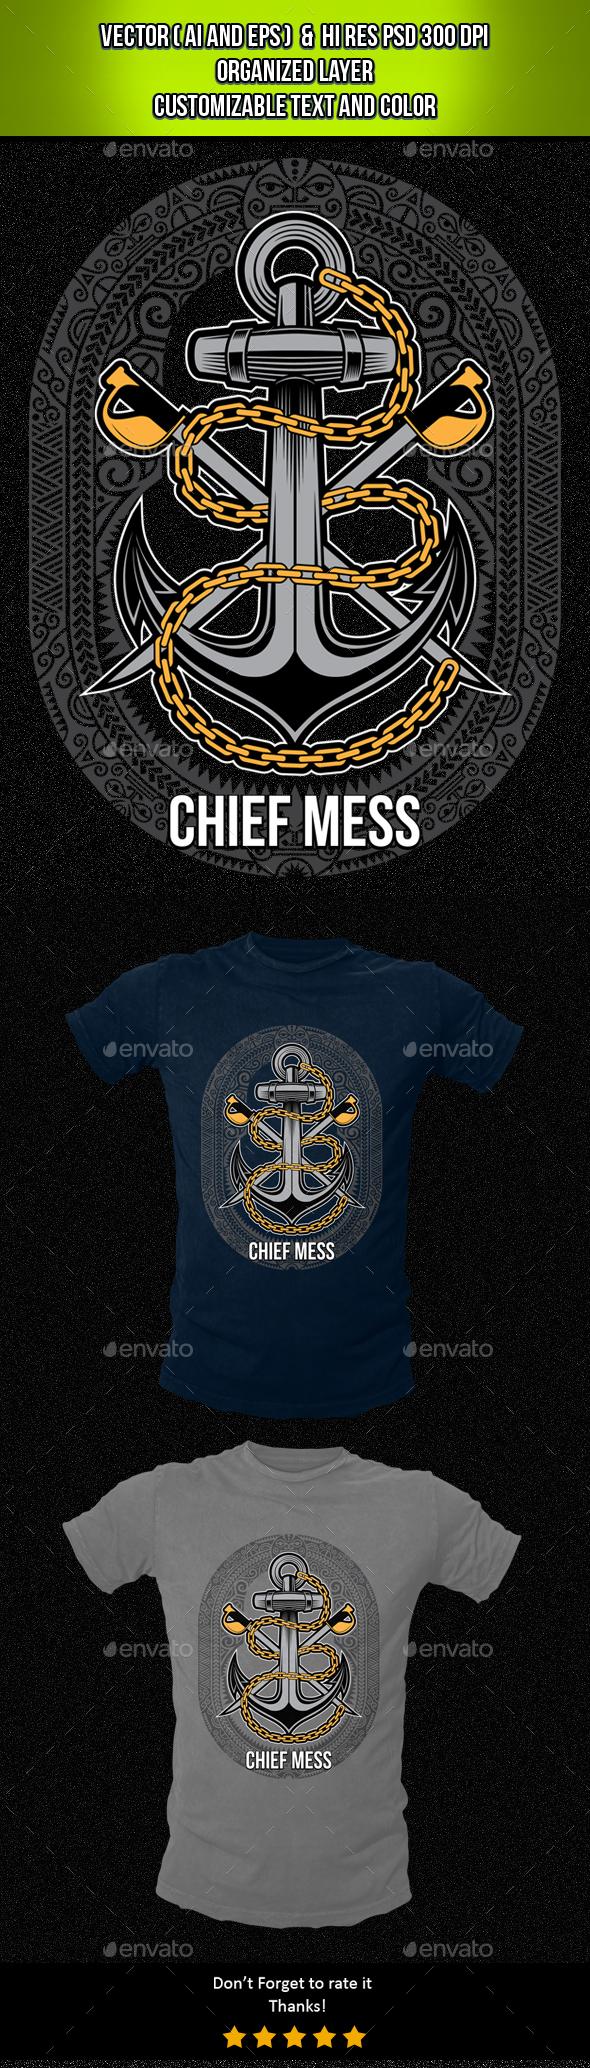 Chief Mess - Designs T-Shirts